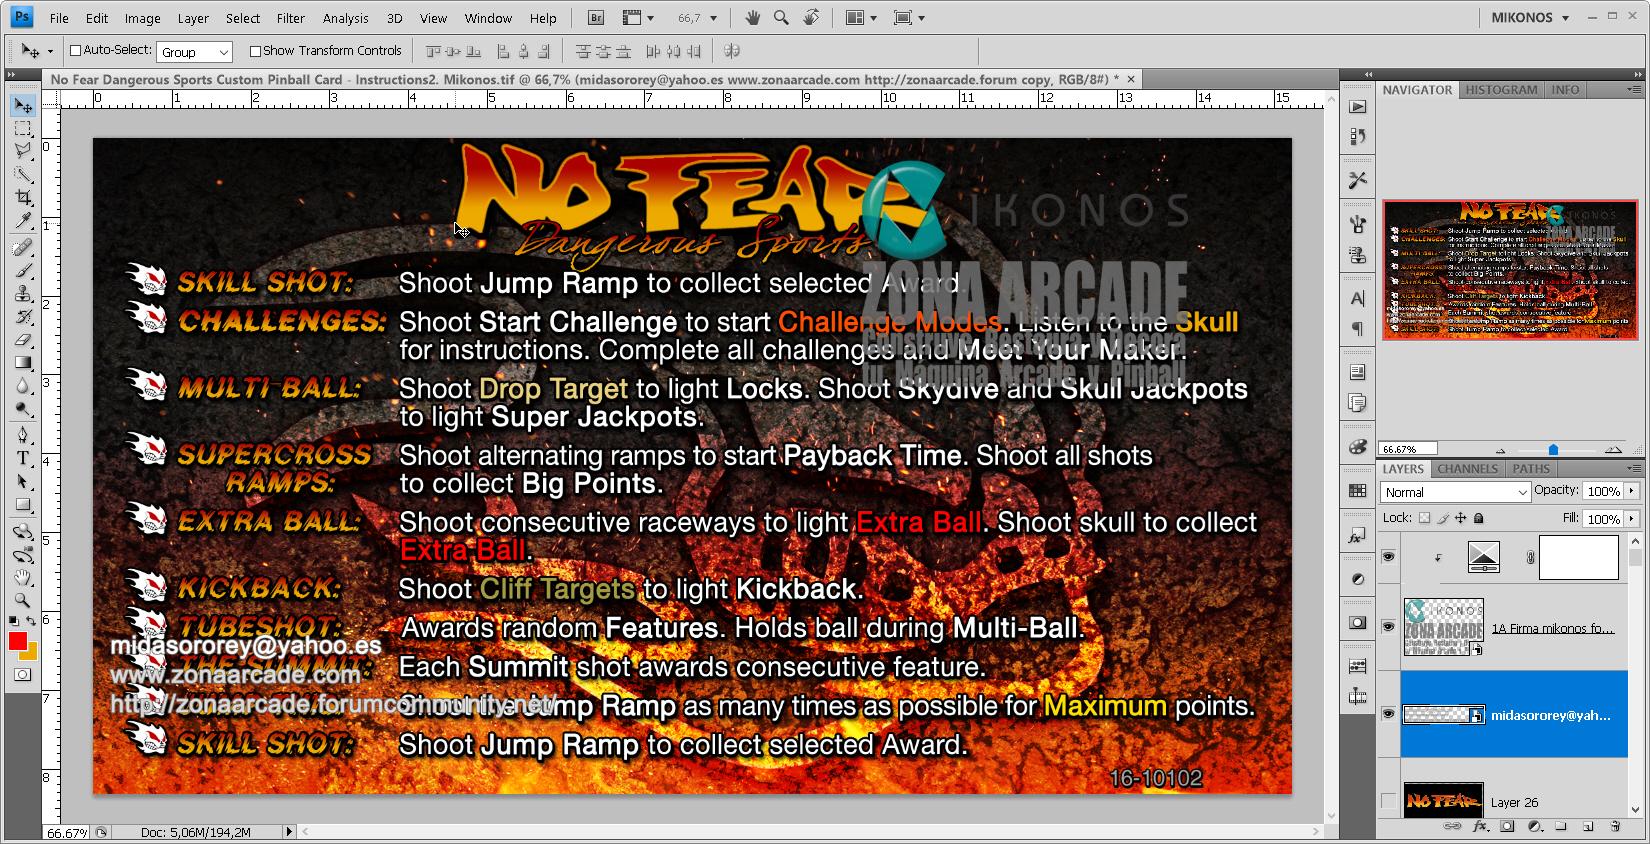 No-Fear-Dangerous-Sports-Custom-Pinball-Card-Rules2-Mikonos1.jpg